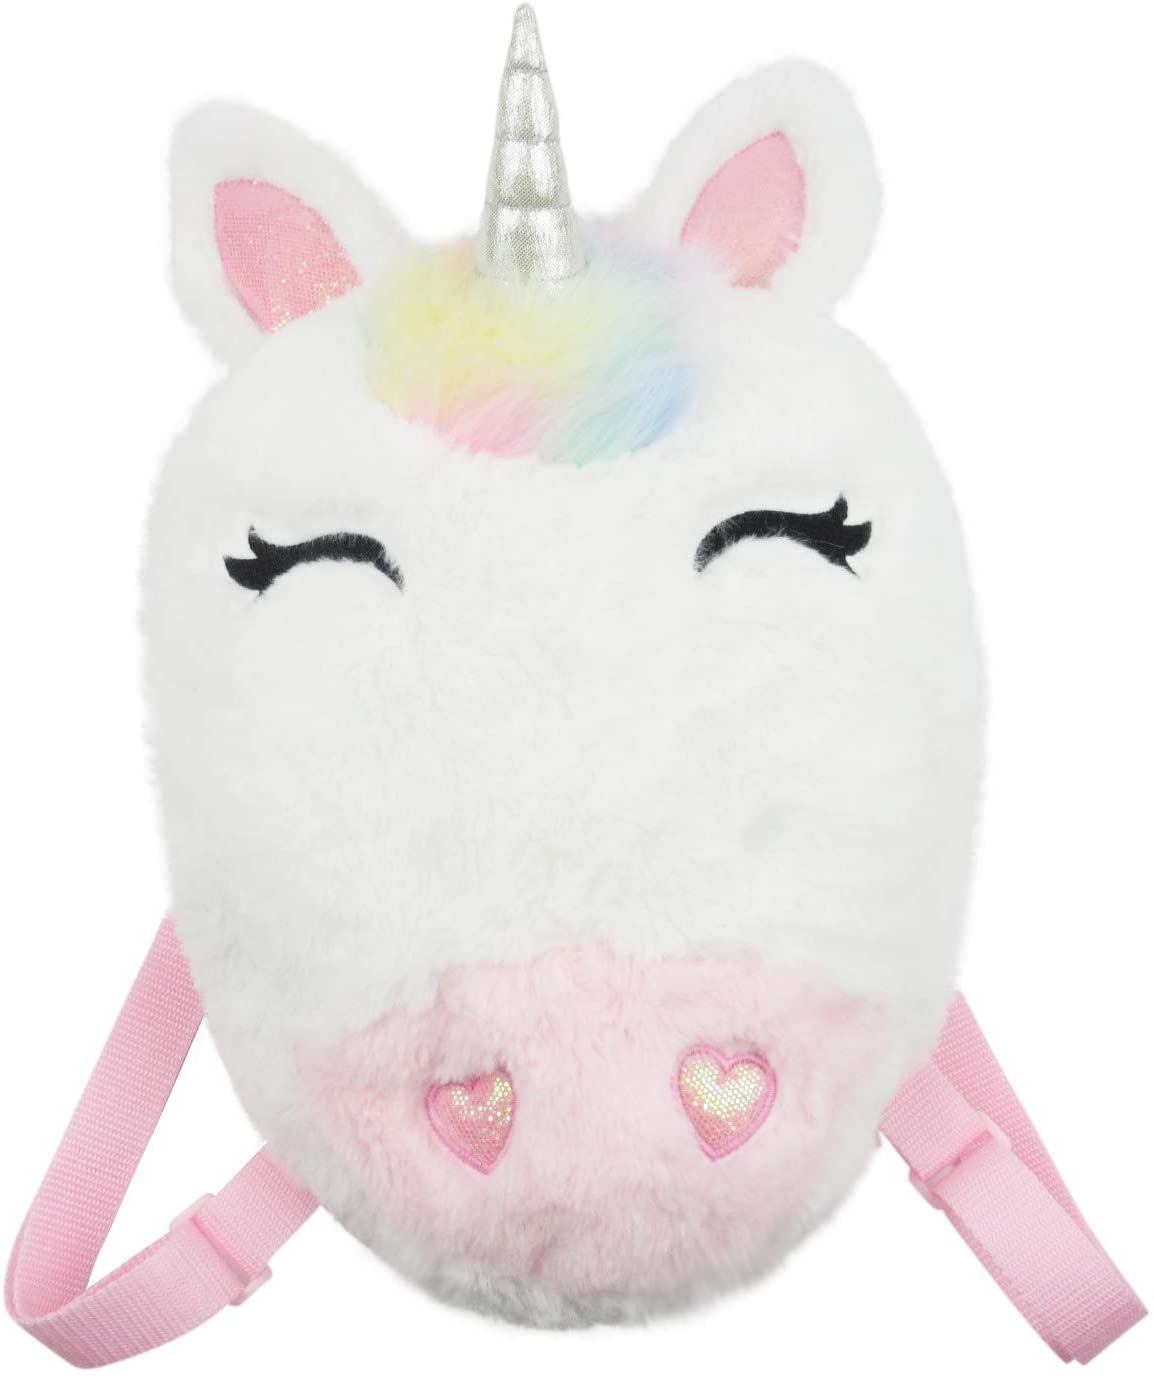 Youngfine Unicorn Plush Novelty Cute Plush Little Girls Boys Animal Backpacks With Back Straps In 2021 Unicorn Stuffed Animal Cute Plush Unicorn Plush [ 1377 x 1154 Pixel ]